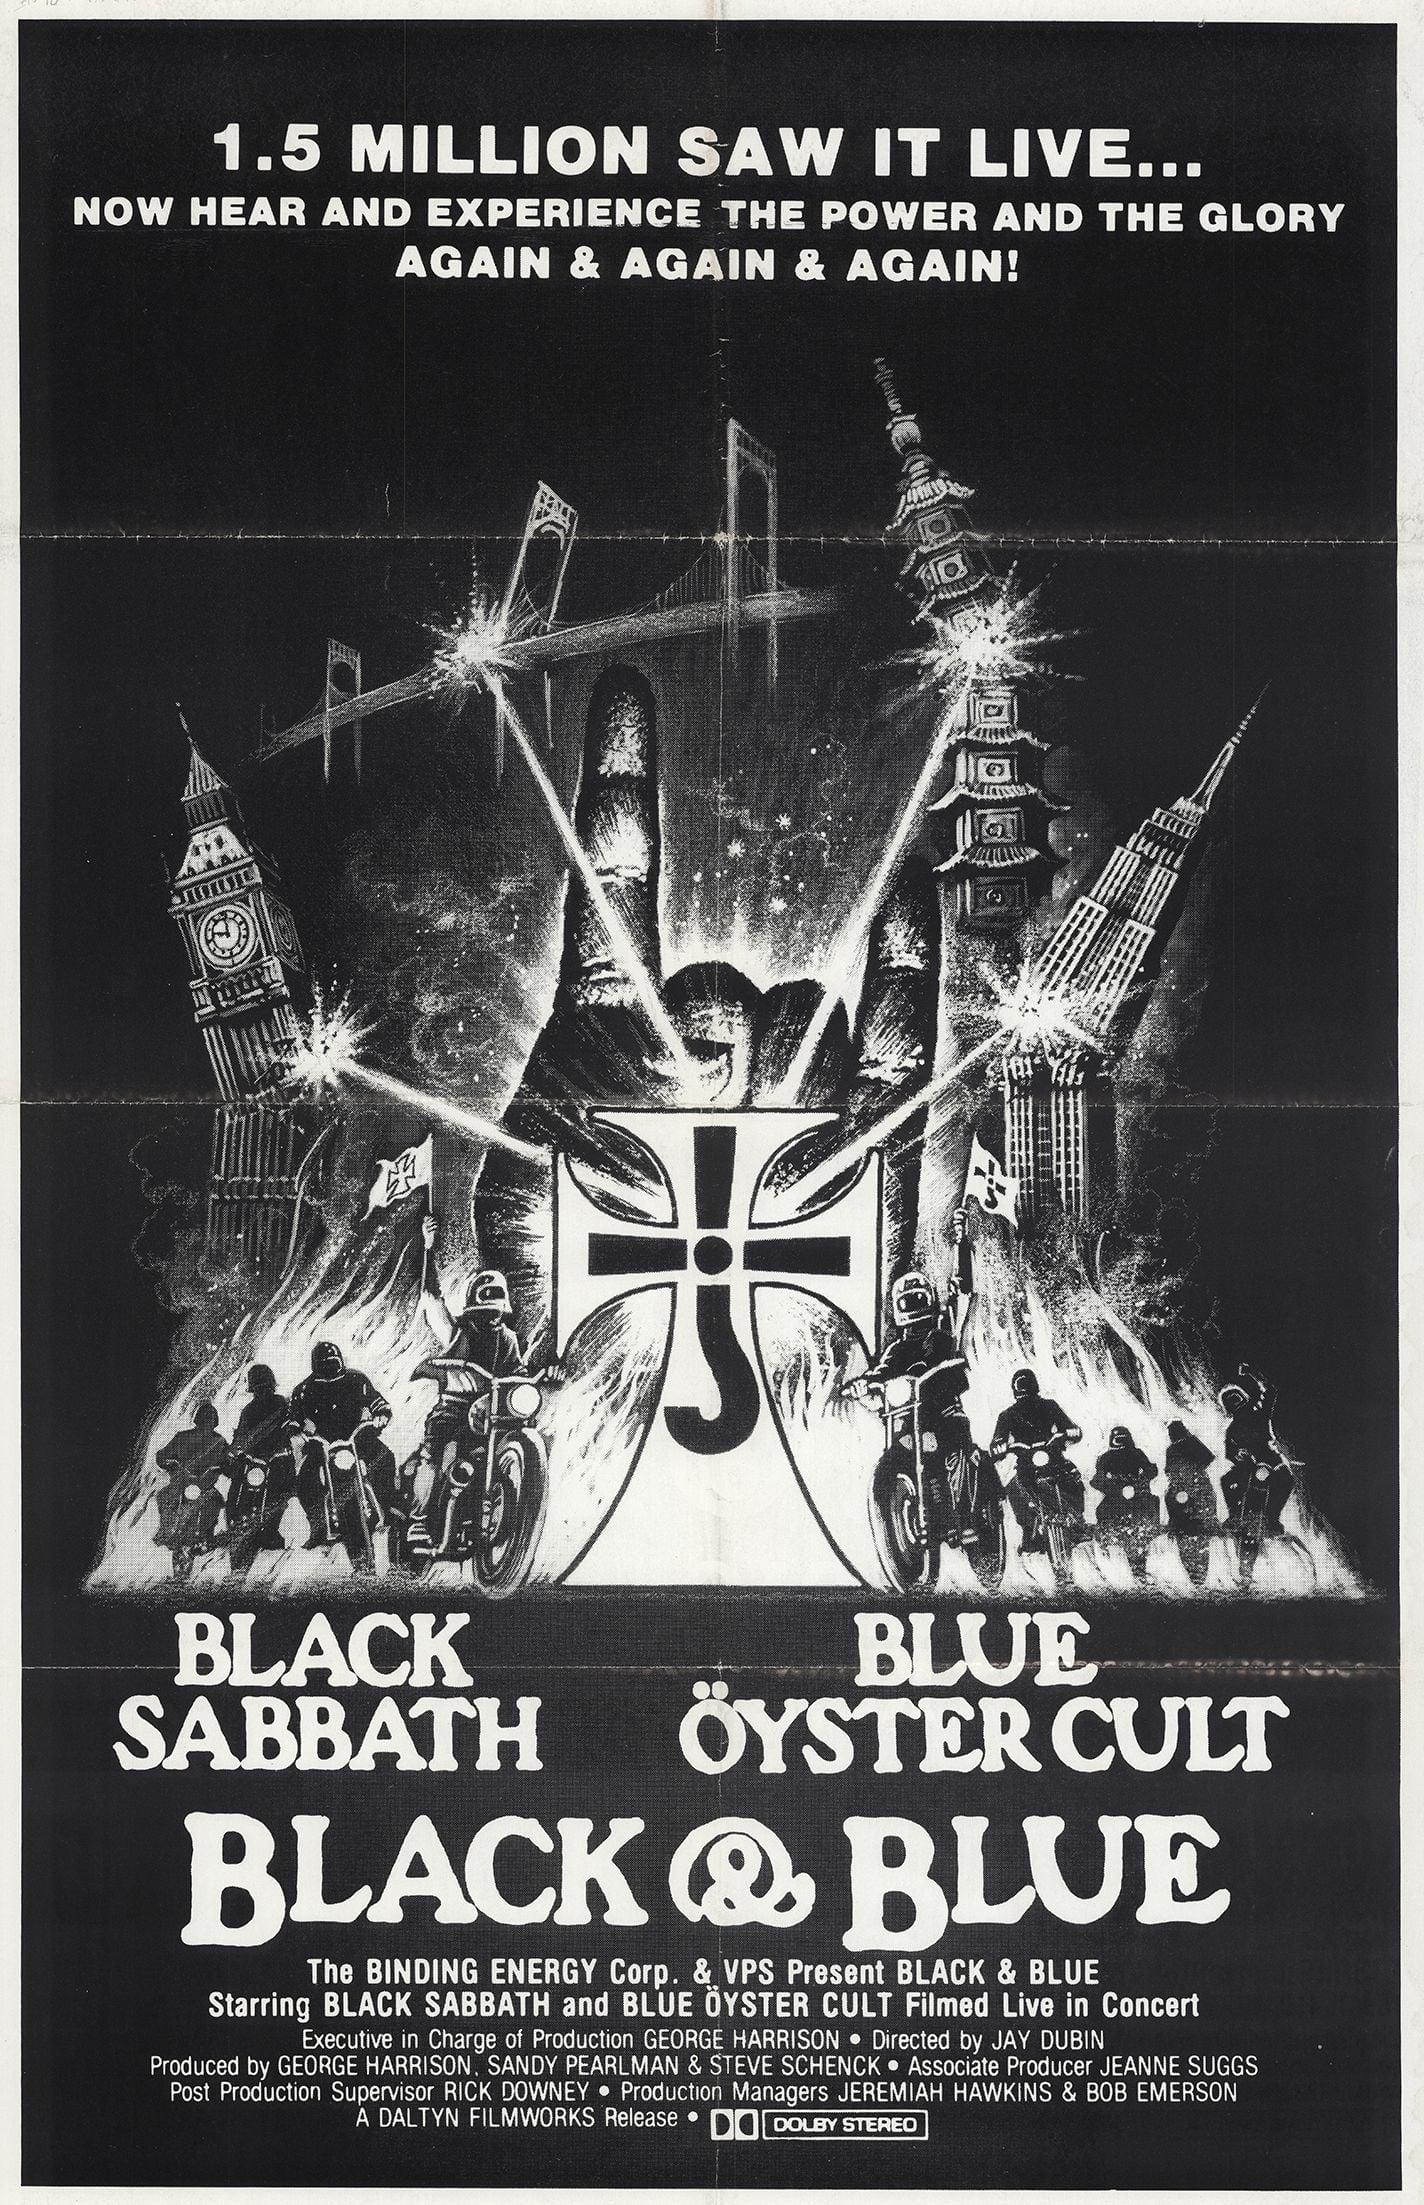 Black Sabbath & Blue Oyster Cult: Black and Blue (1981)